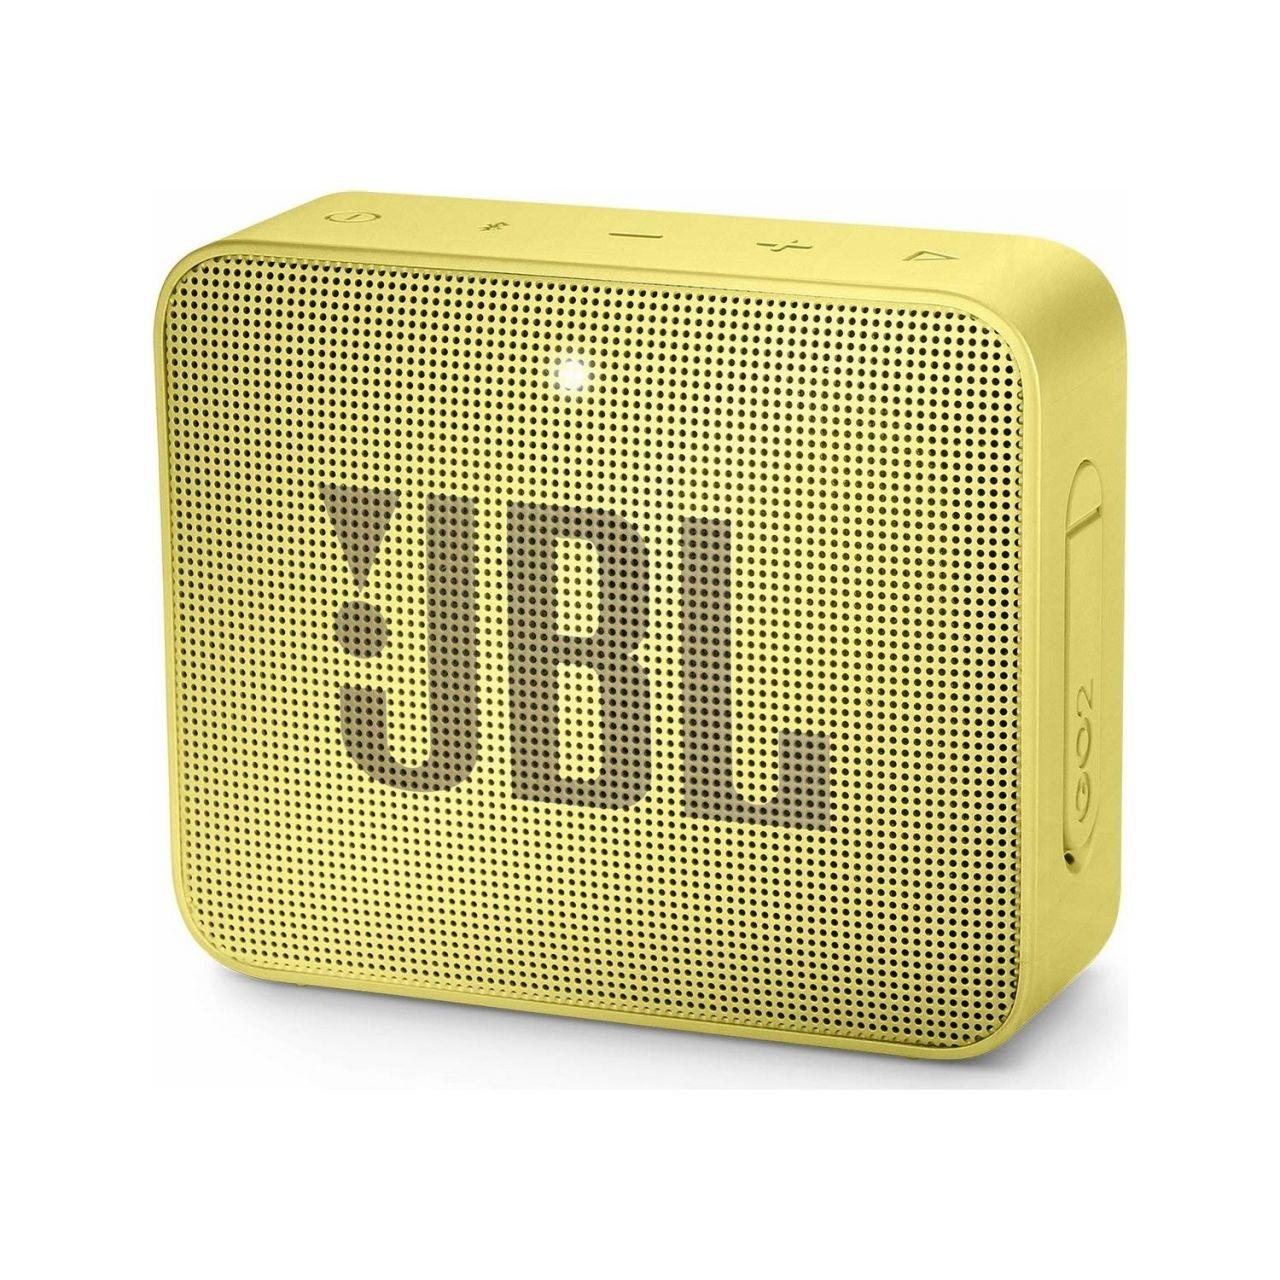 250 TL altı en iyi 10 Bluetooth hoparlör - Ocak 2020 - Page 1